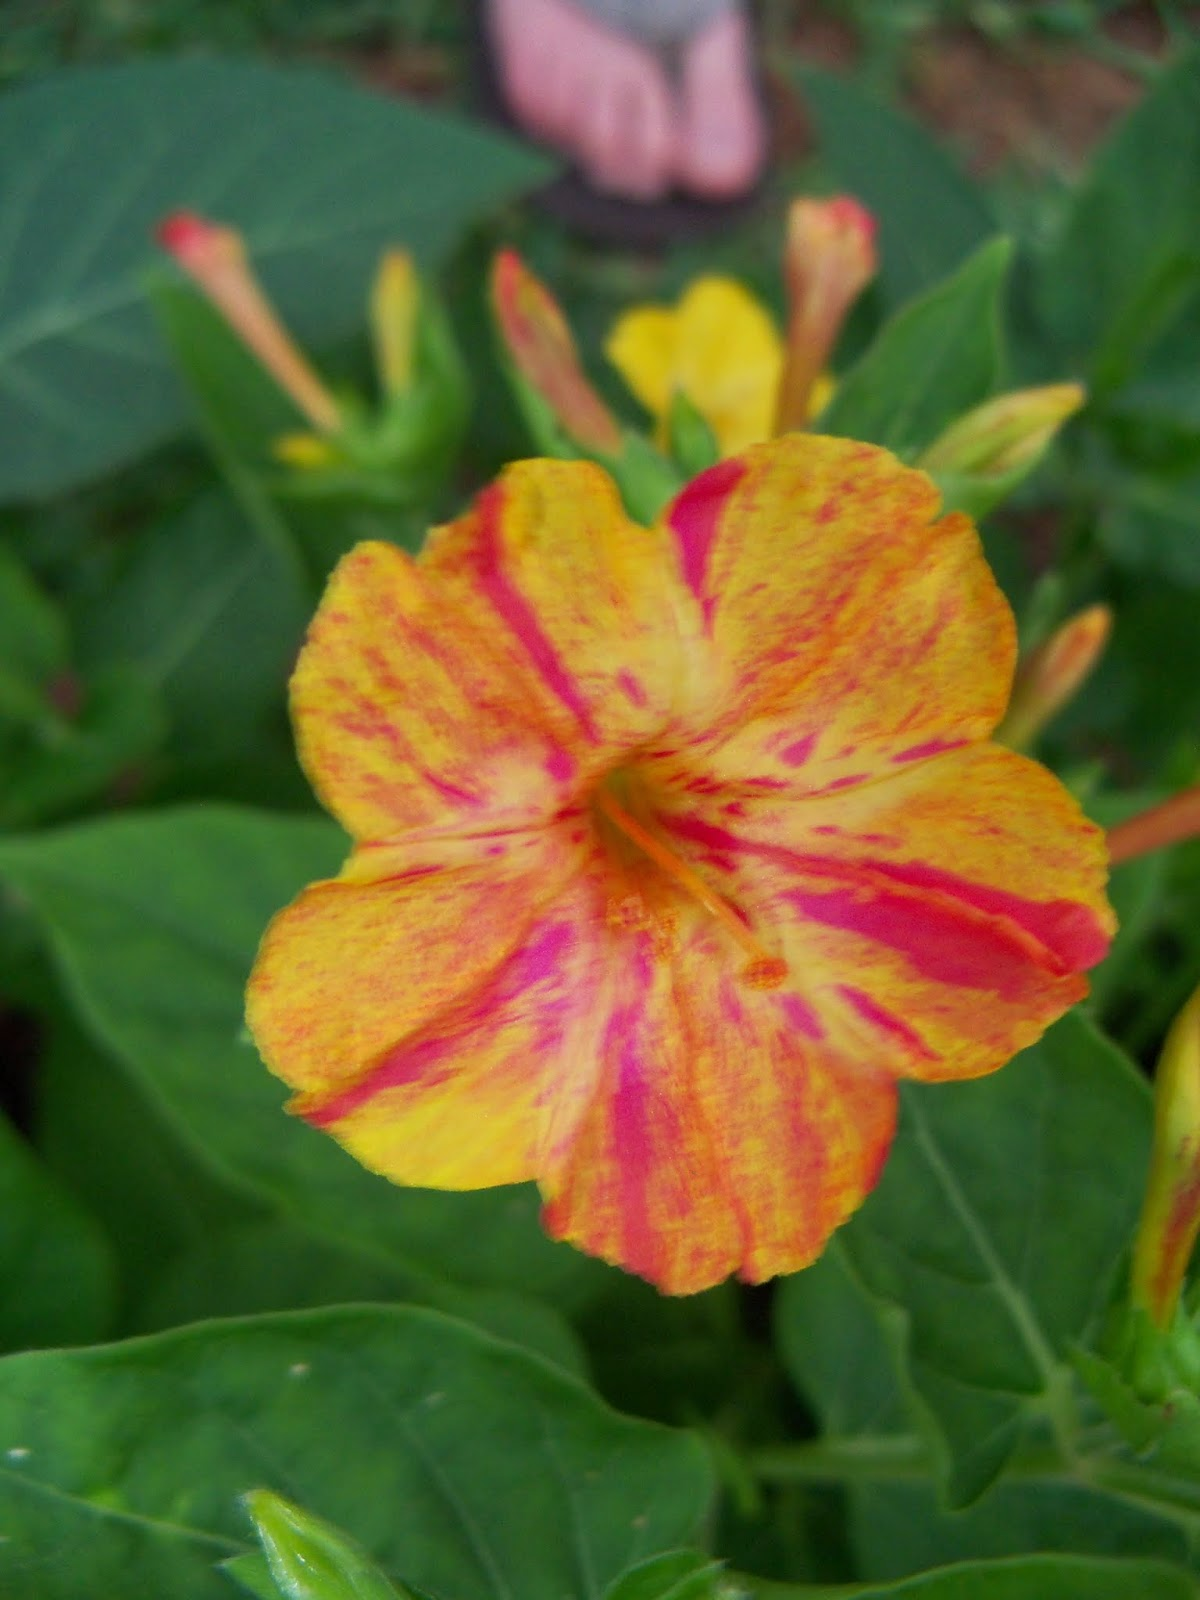 Gardening 2014 - 116_1968.JPG